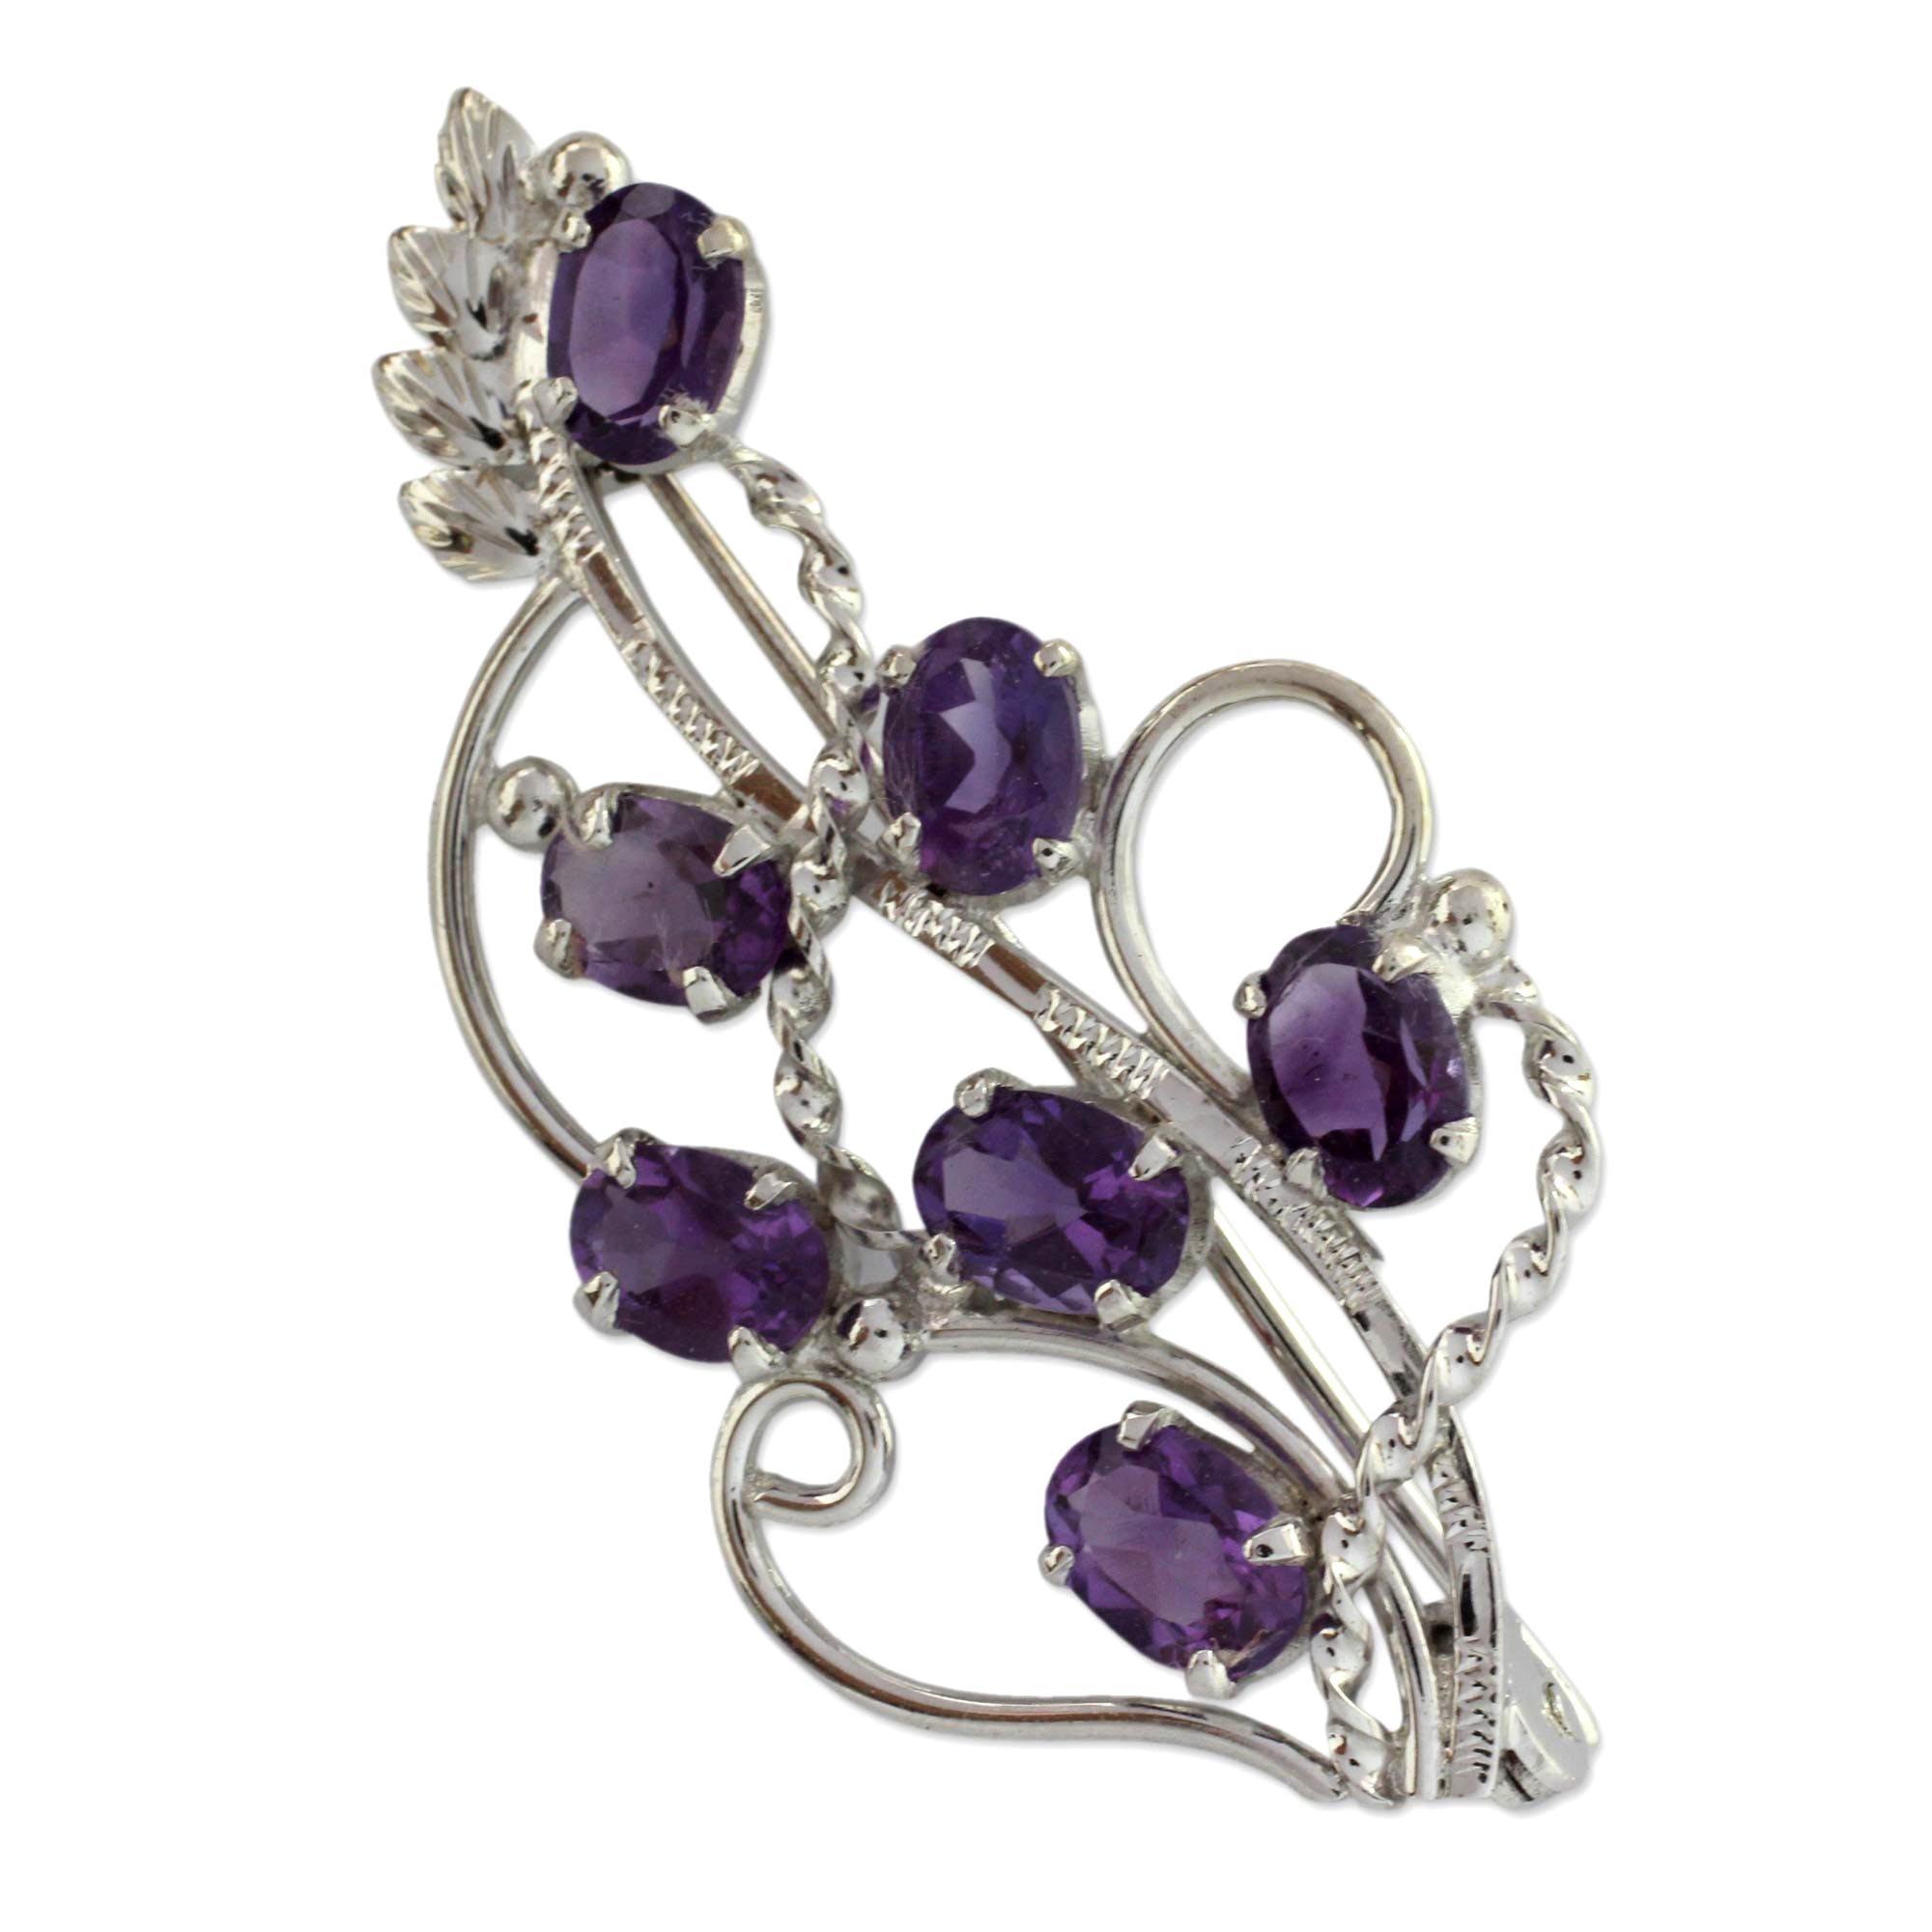 NOVICA Amethyst .925 Sterling Silver Floral Brooch 'Lilac Story'